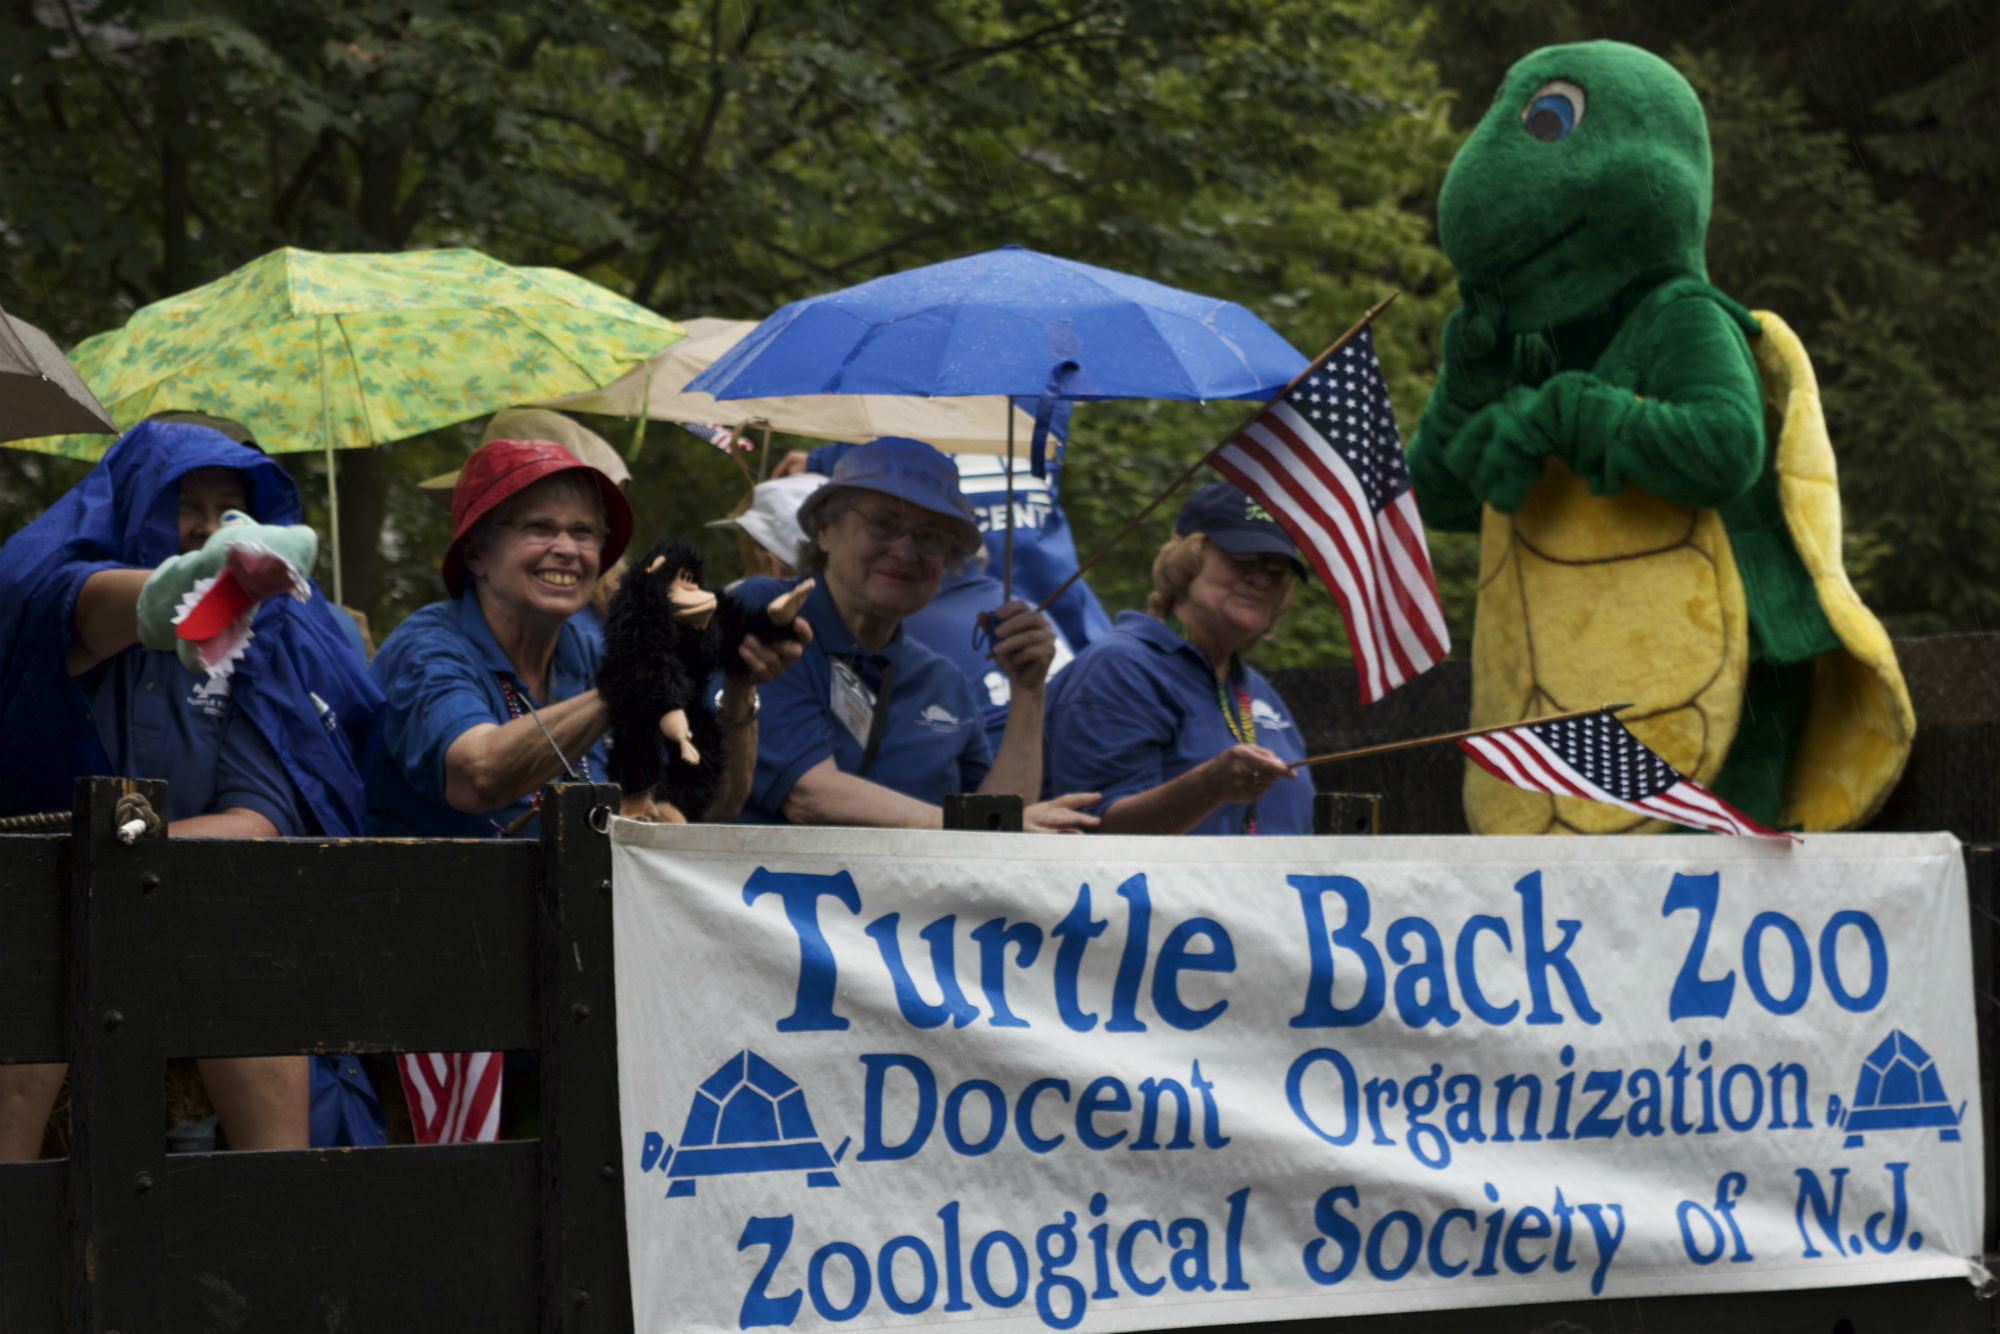 ceec01beb0c9a2869388_Turtle_Back_Zoo.jpg